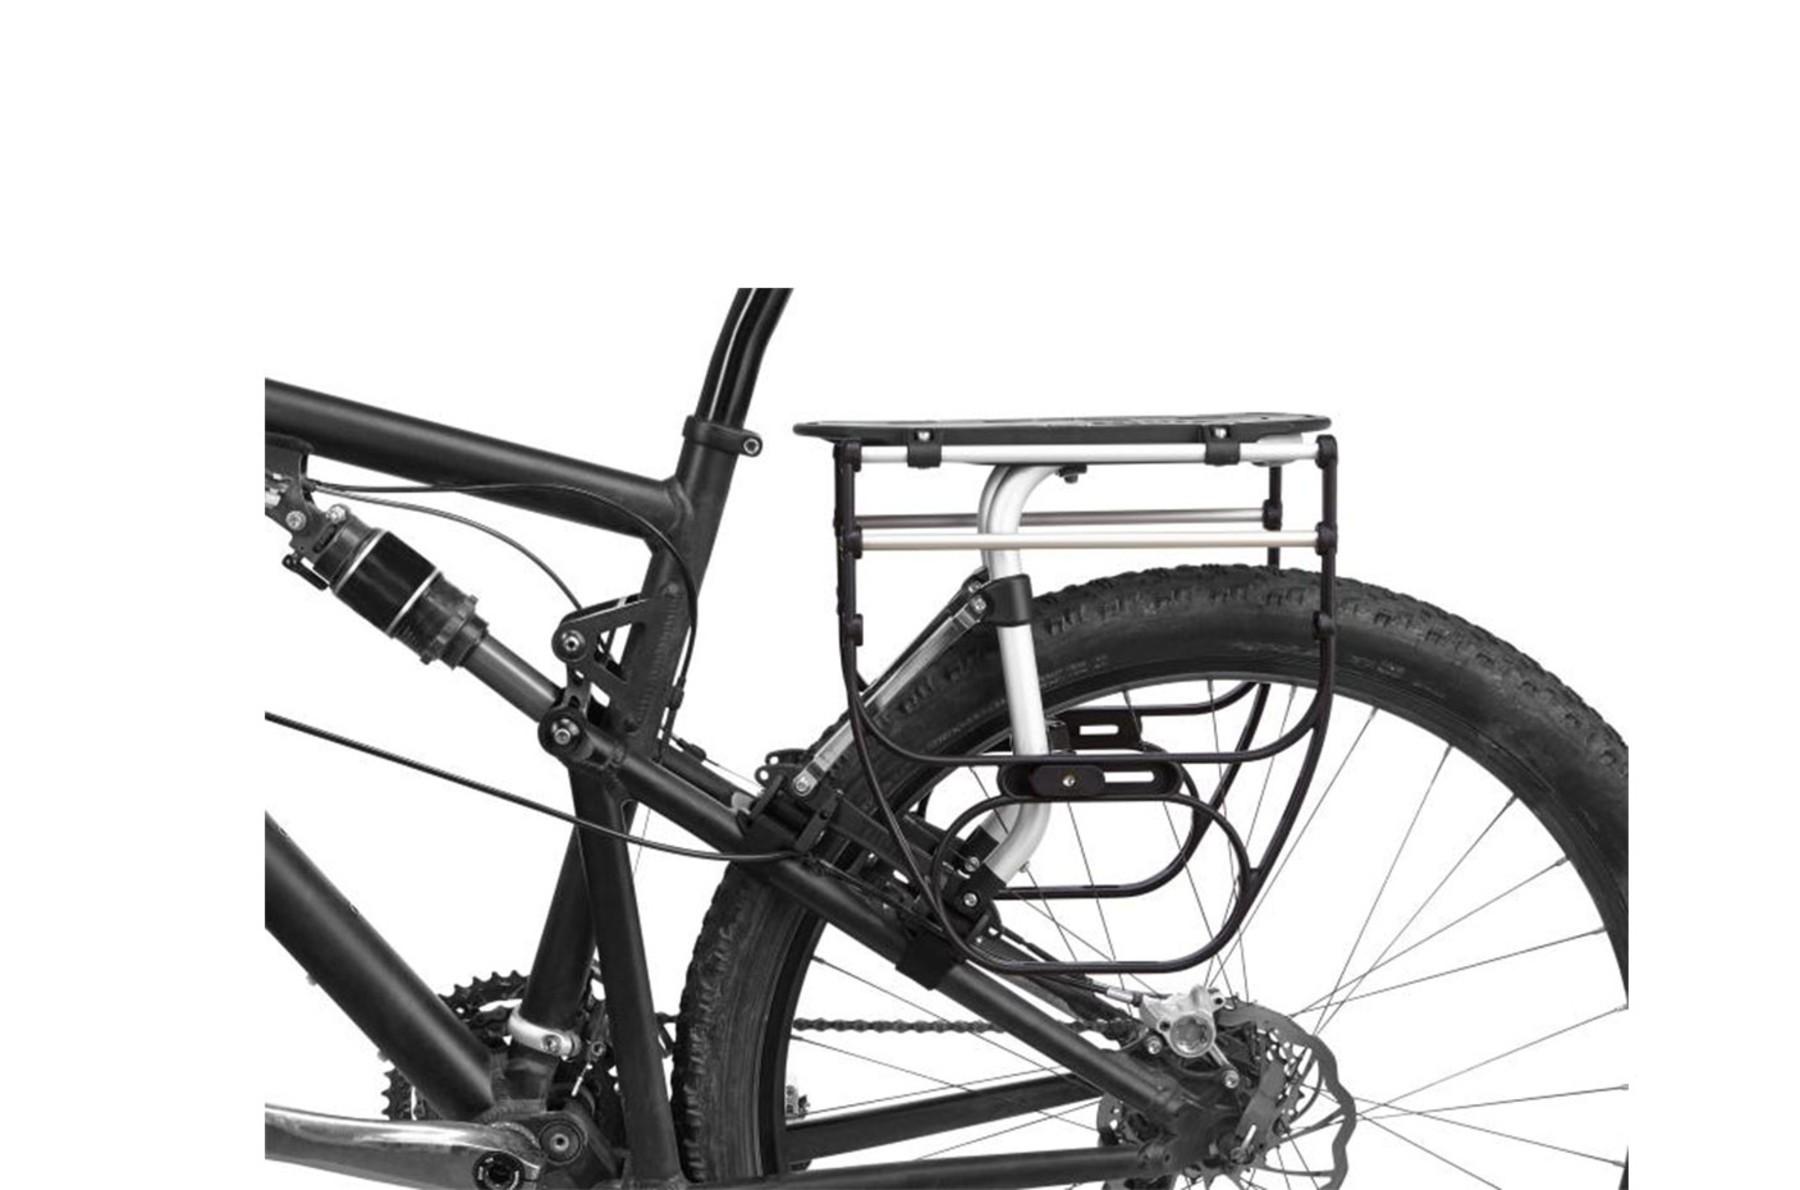 Bagageiro Bike Tour Rack 100090 Thule + 1 Adaptador Side +NF